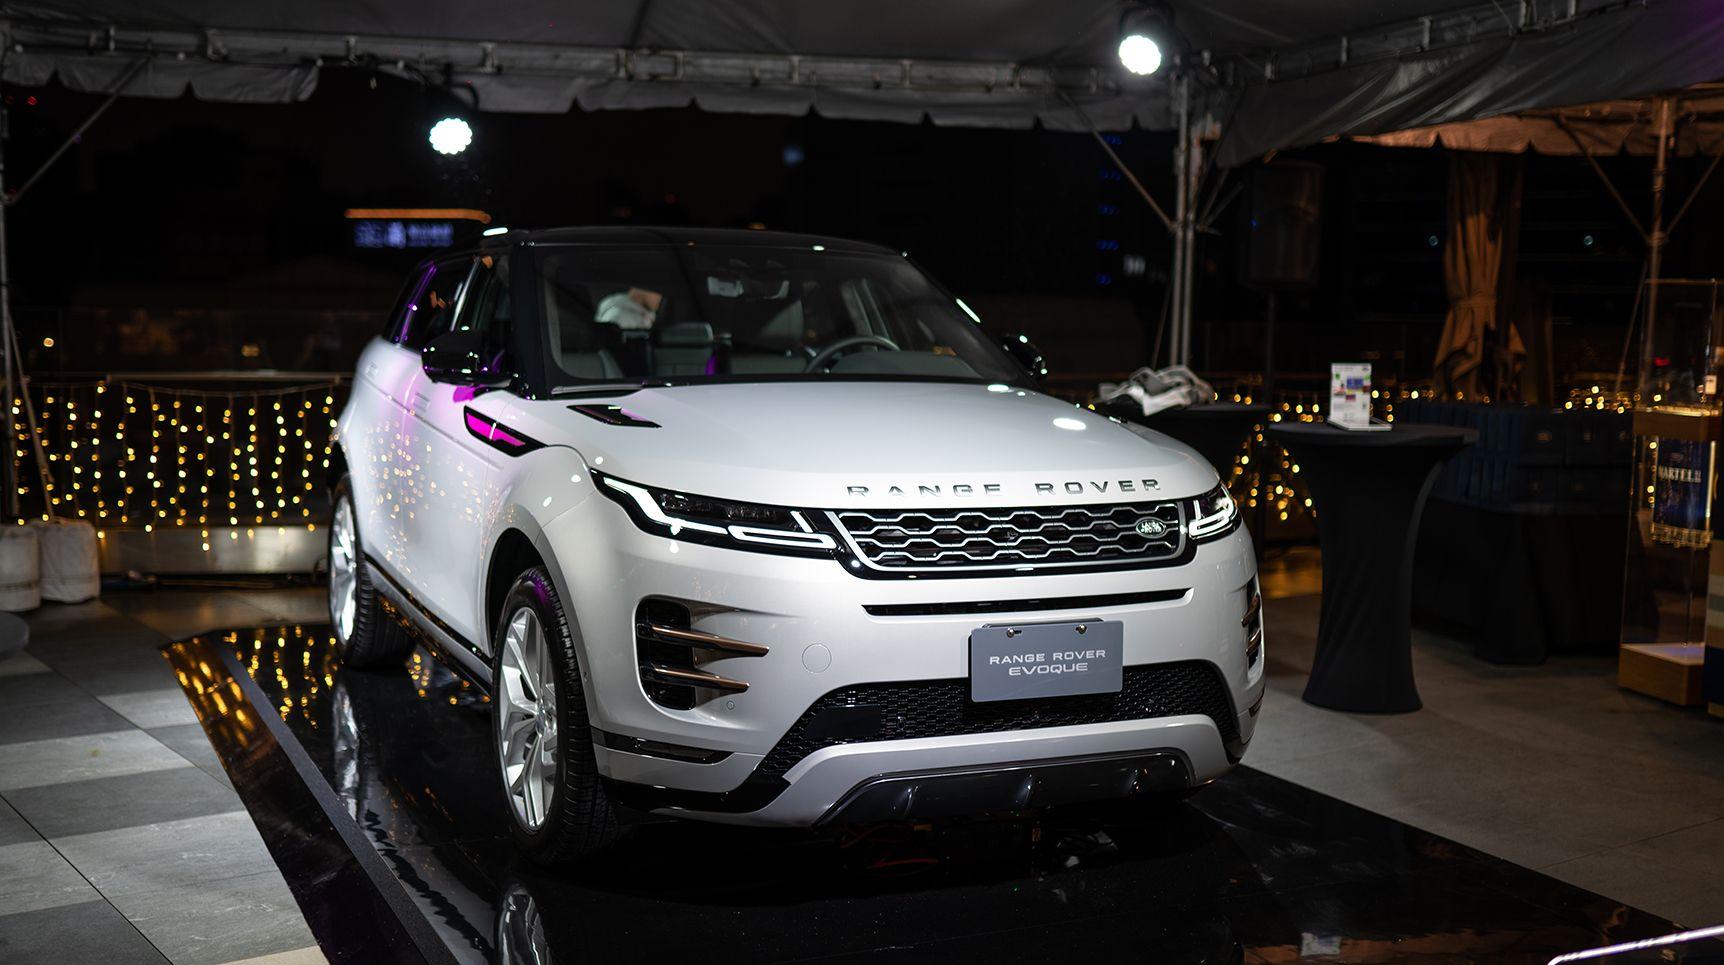 Off Menu Taiwan盛會的賞玩亮點—New Range Rover Evoque 無意放閃卻自成焦點!